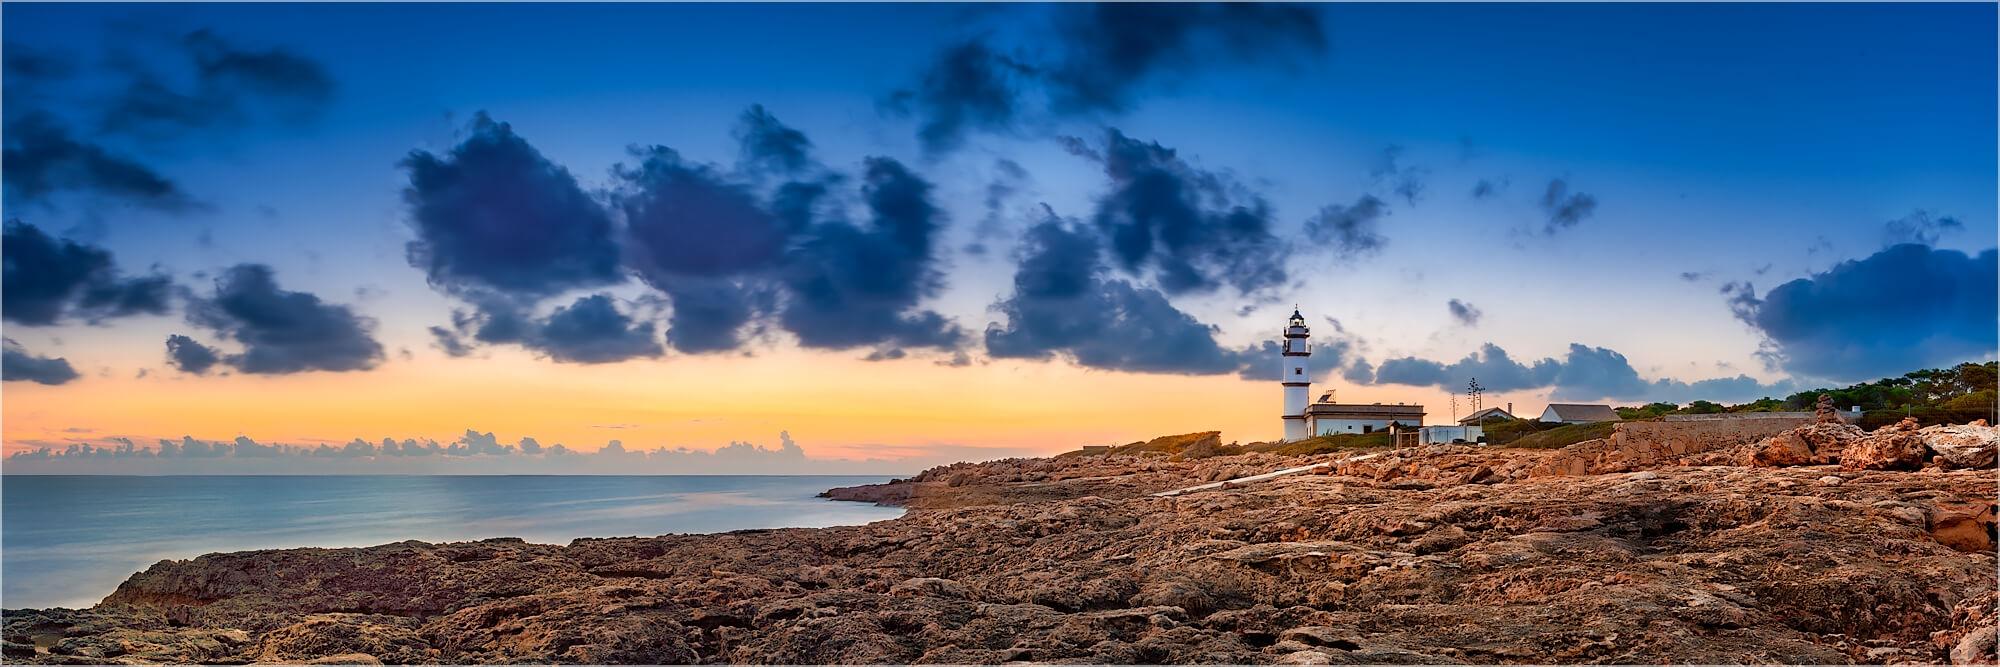 Panoramafoto Mallorca Ses Salinas Leuchtturm